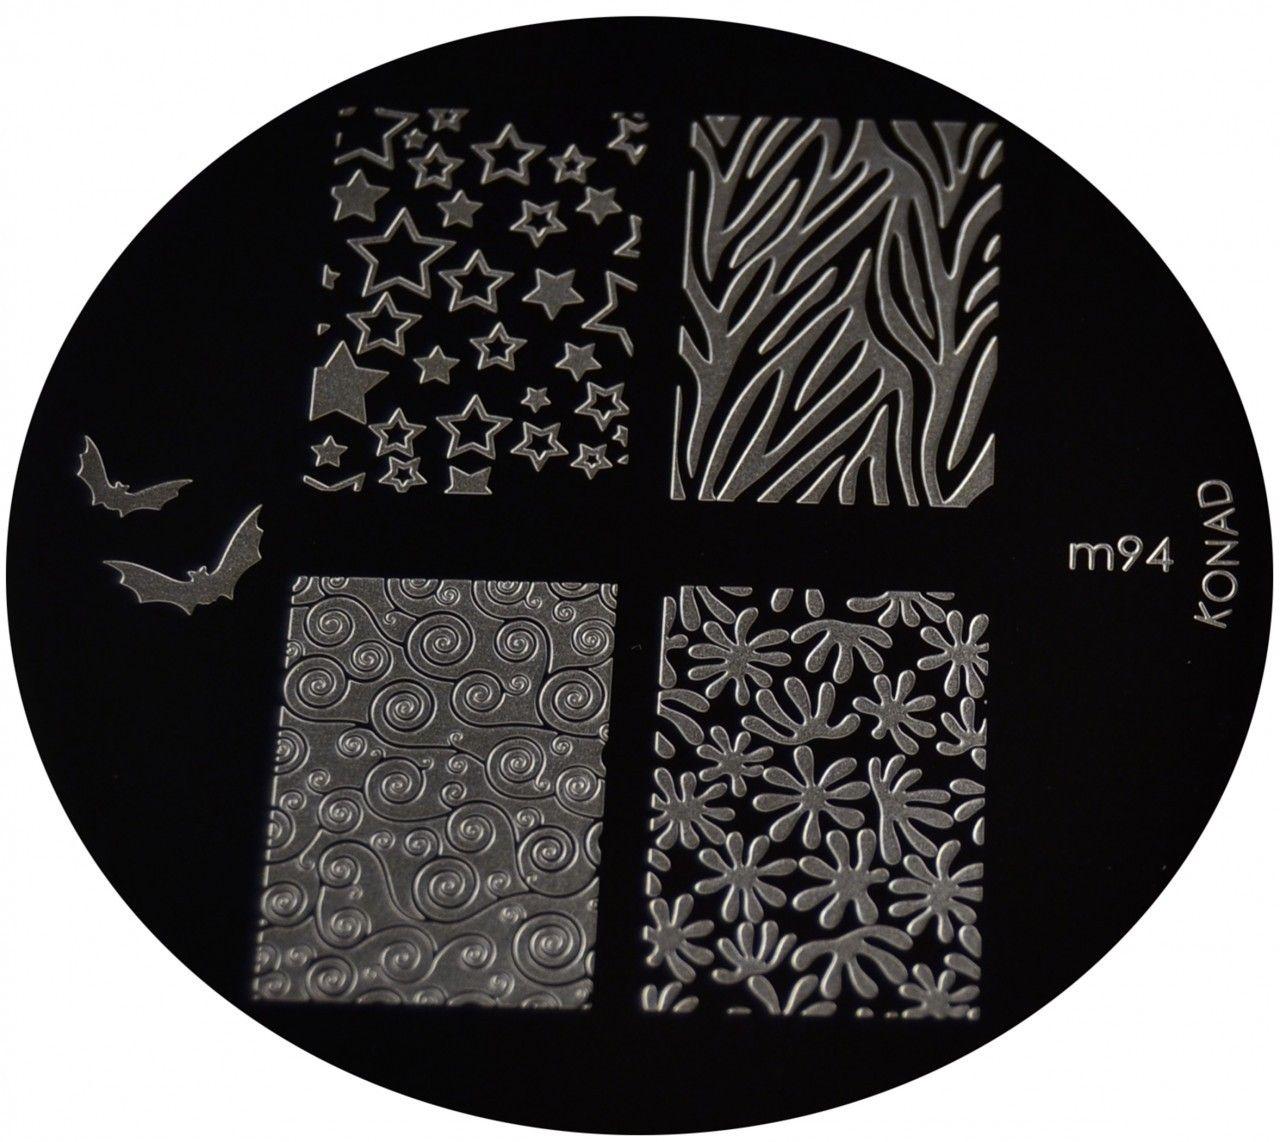 Konad nail art image plate m full nail flowers stars bat